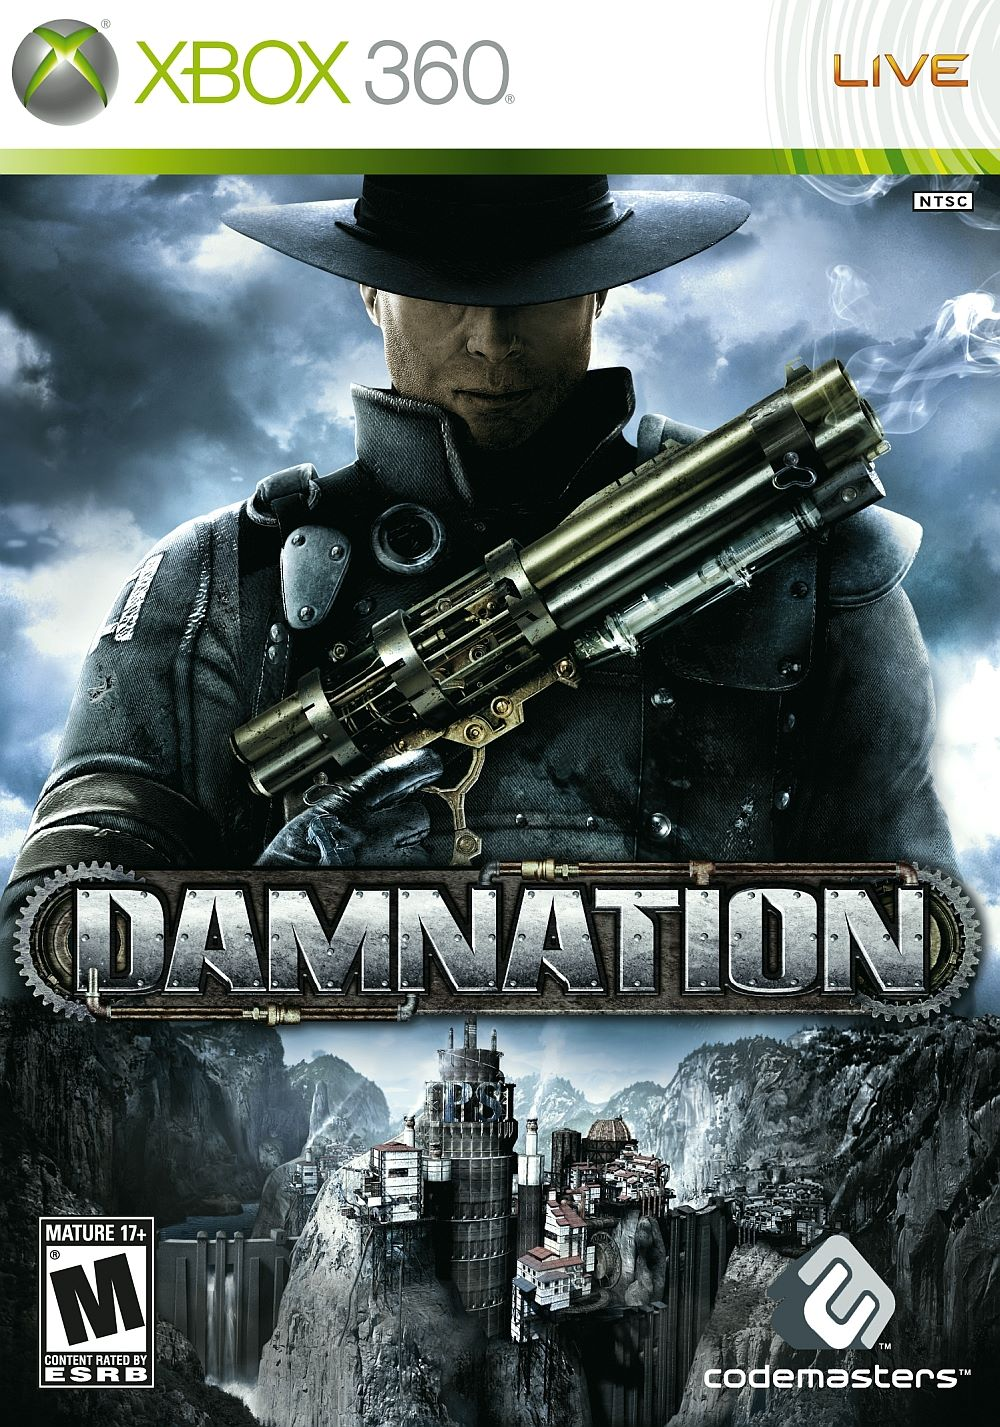 Amazon.com: Mature - Games / Xbox One: Video Games